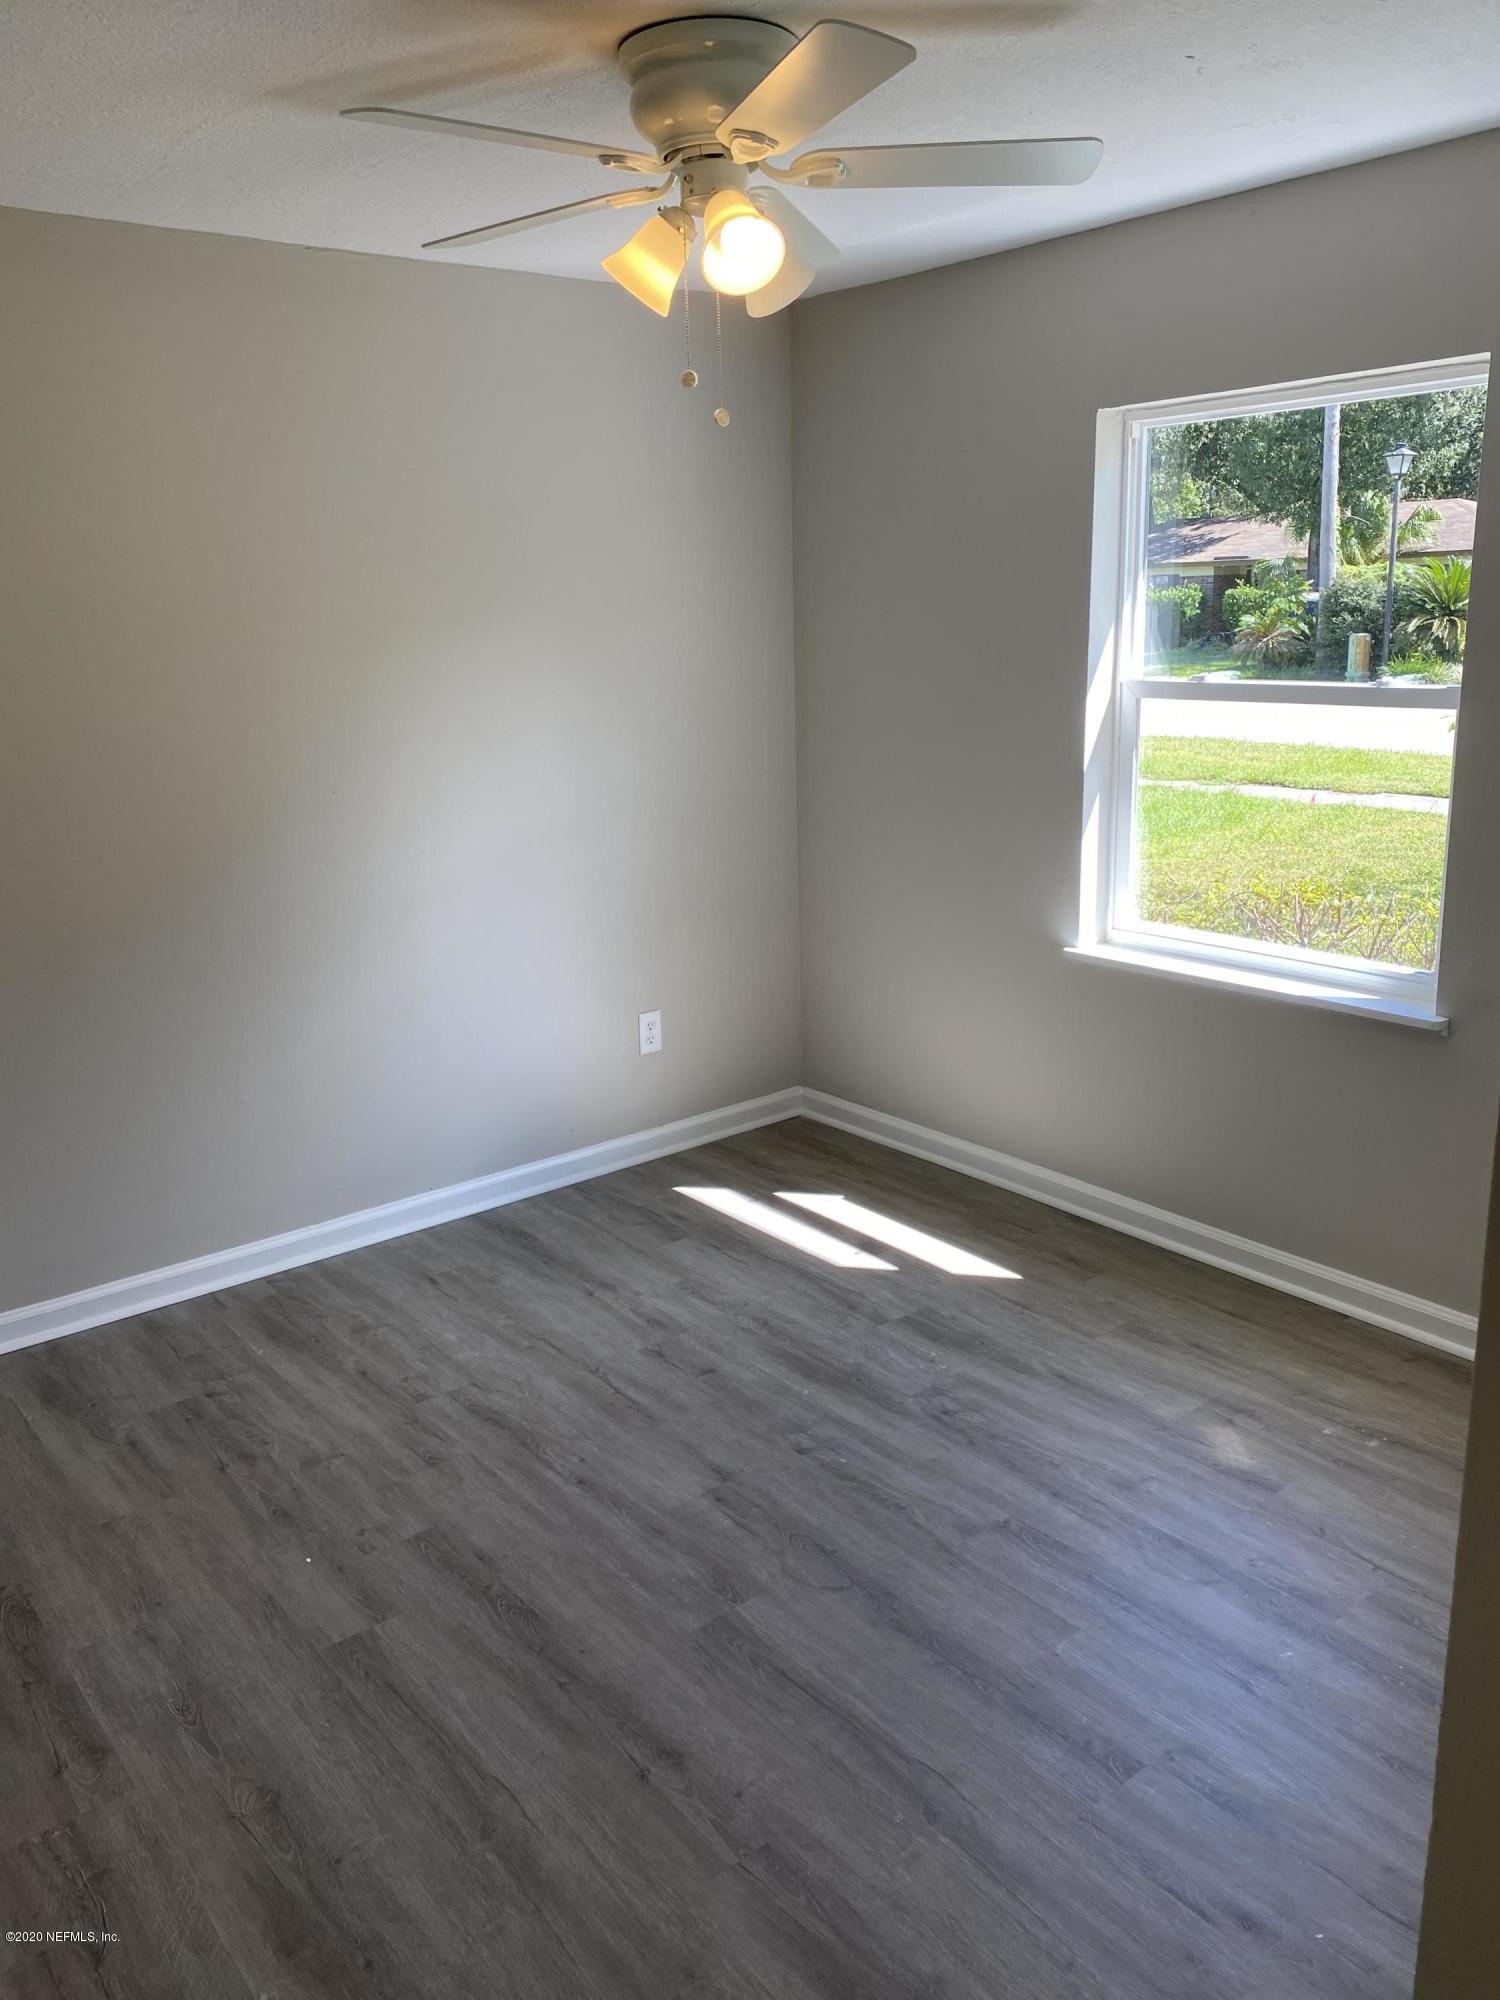 11520 GWYNFORD, JACKSONVILLE, FLORIDA 32223, 3 Bedrooms Bedrooms, ,2 BathroomsBathrooms,Residential,For sale,GWYNFORD,1076122